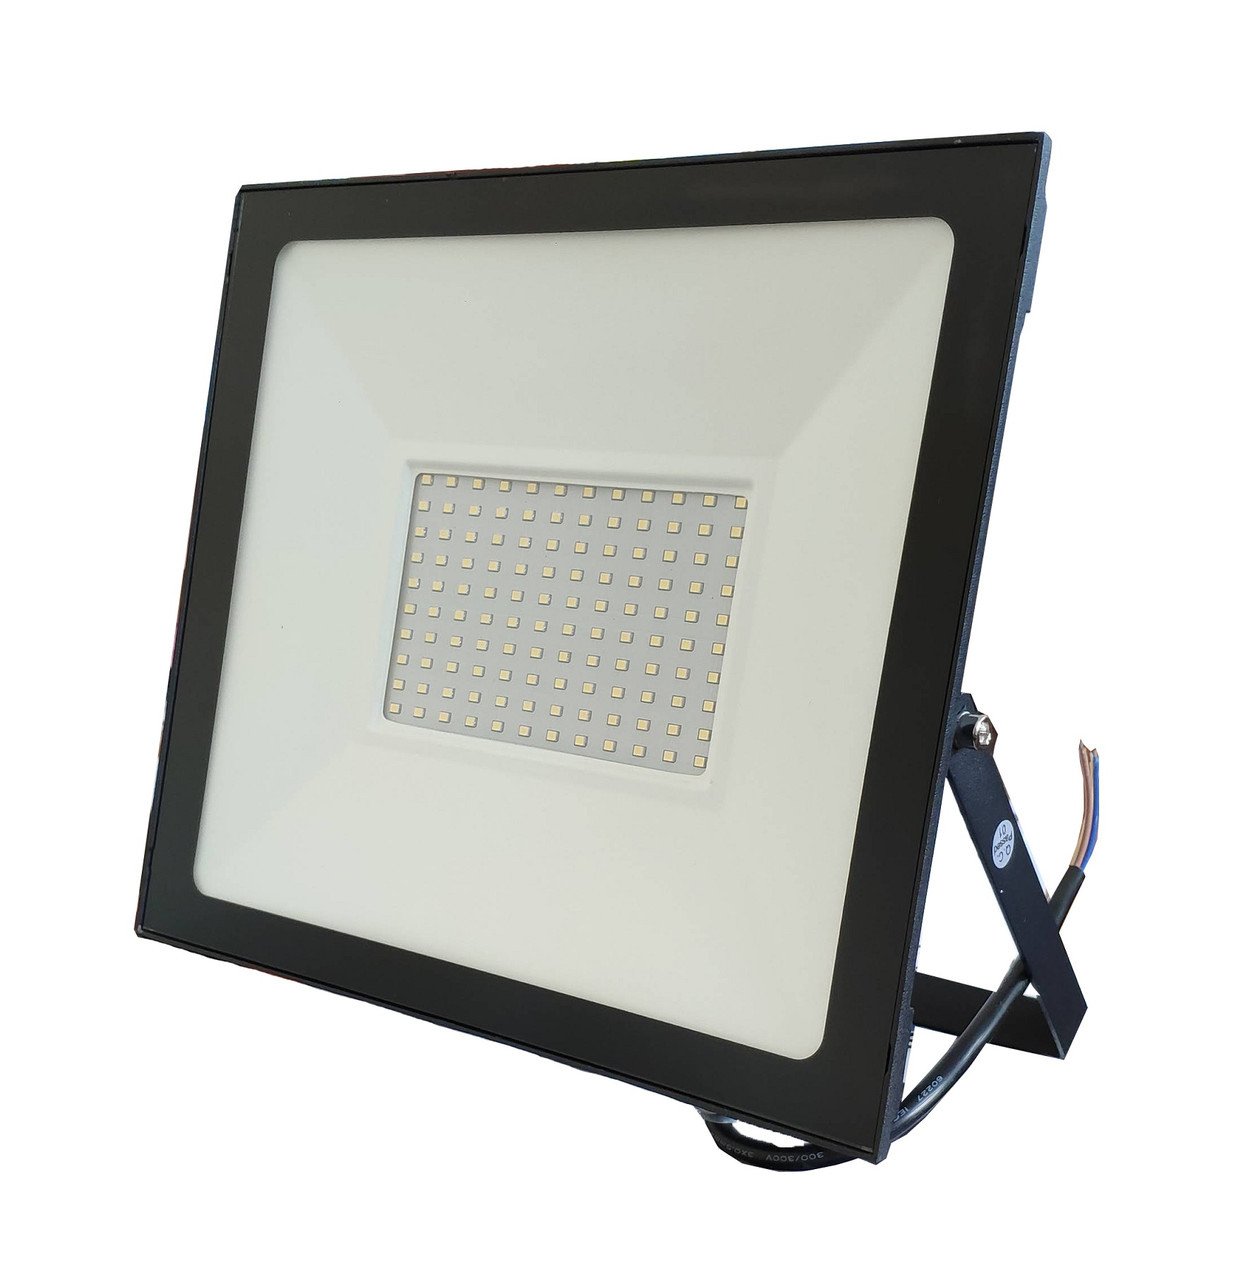 Прожектор LED 50W ECO Slim  220V 3500Lm 6500K IP65 TNSy